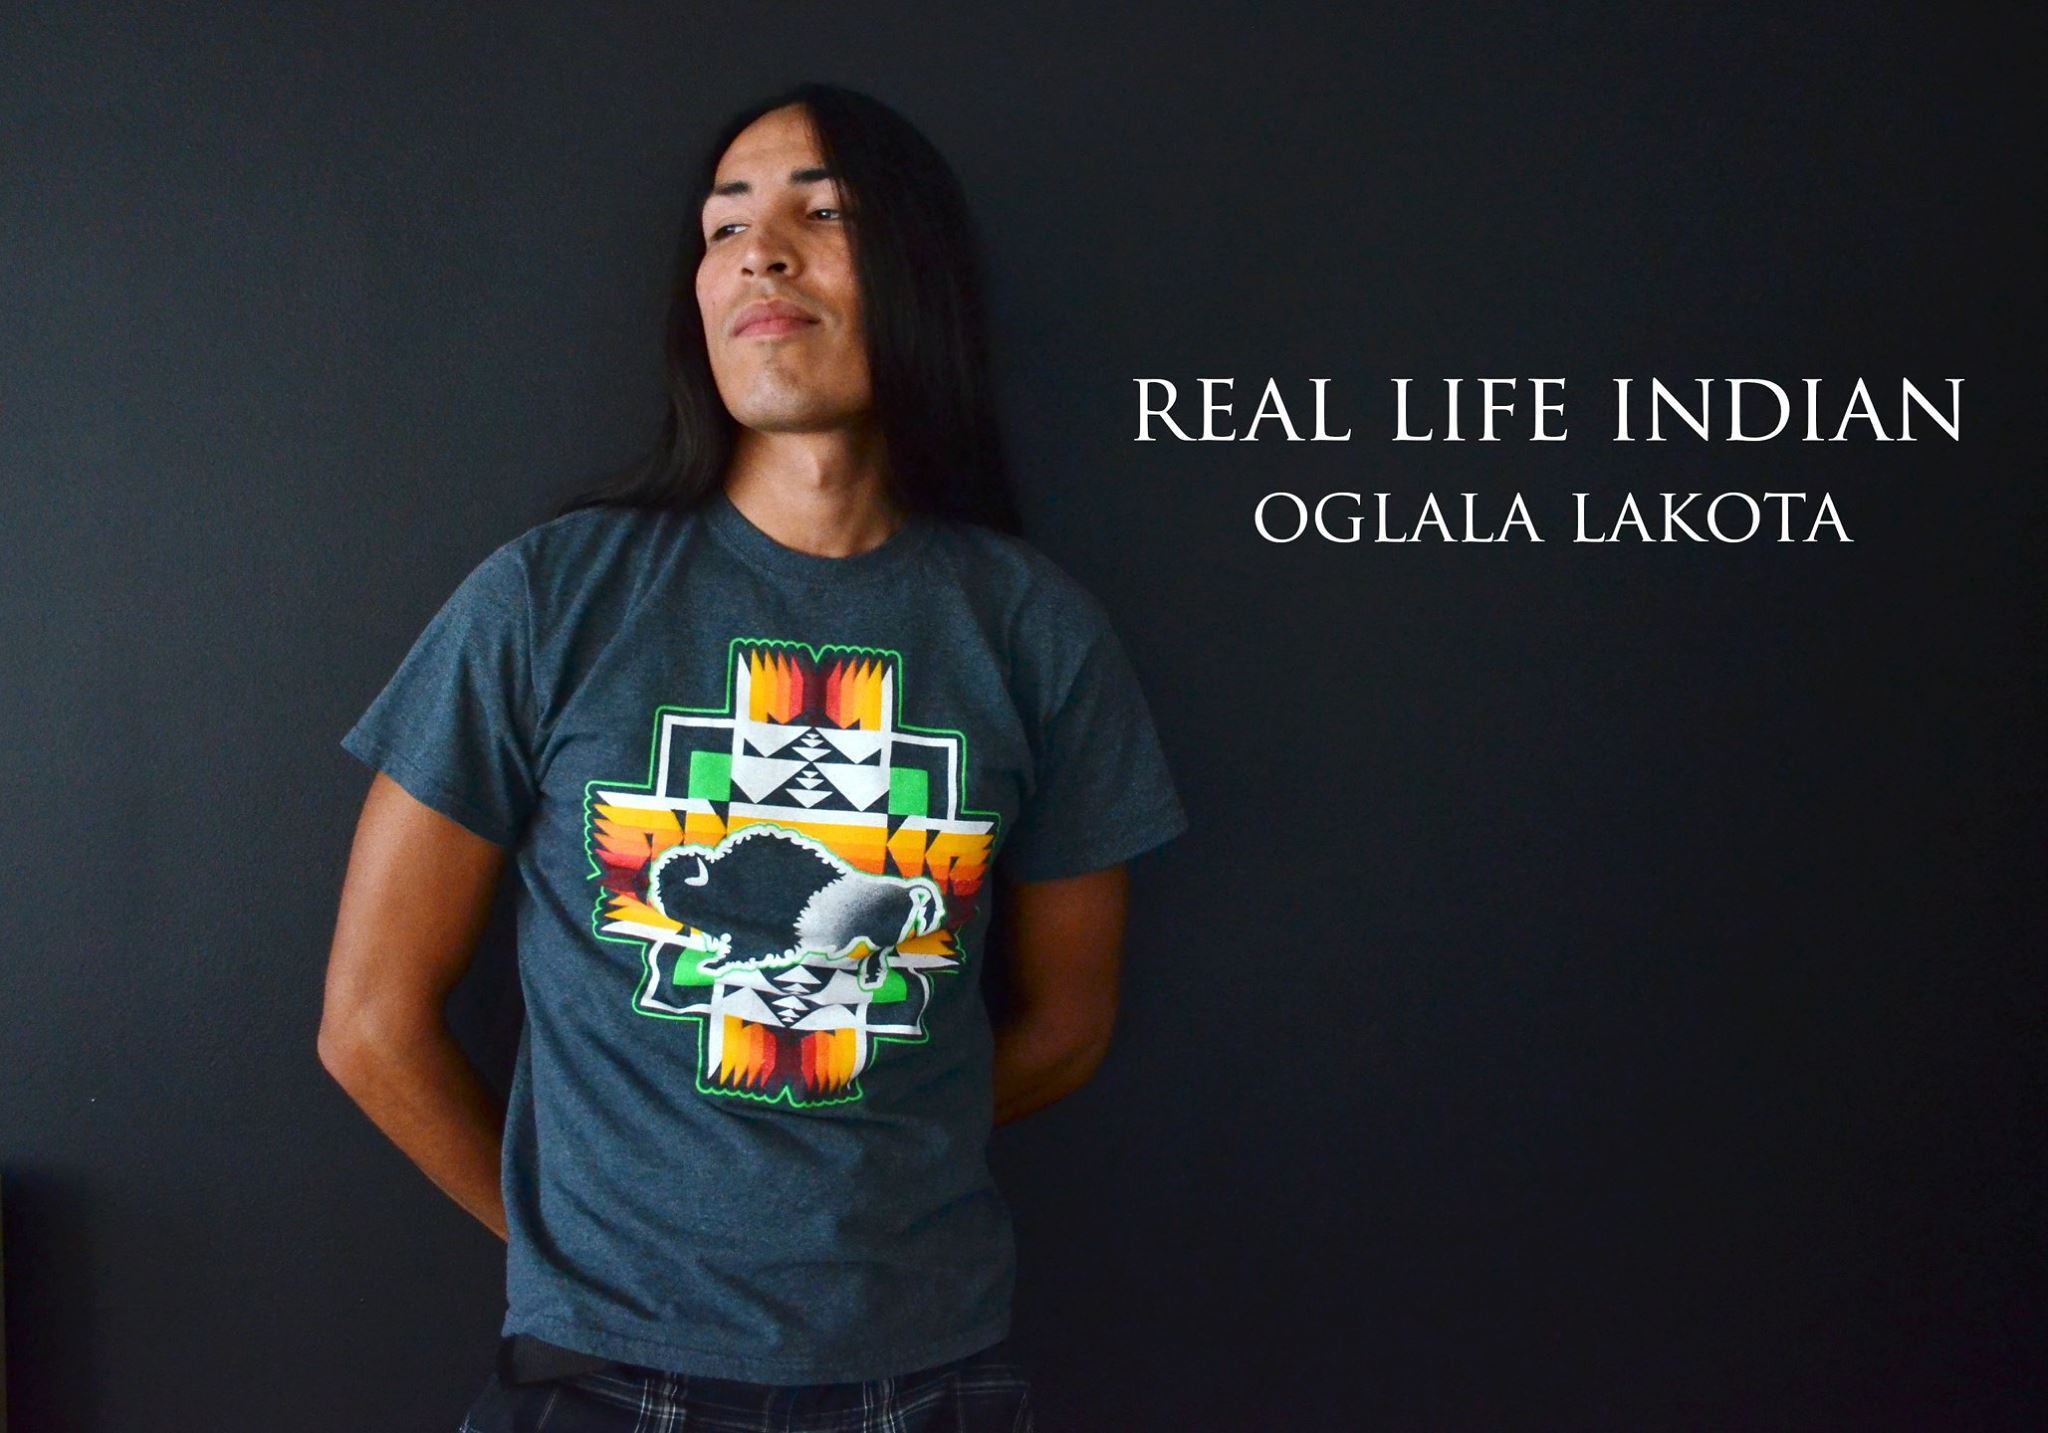 Cankpe Opi el tiospaye waye kin hetanhan (My family is from Wounded Knee)